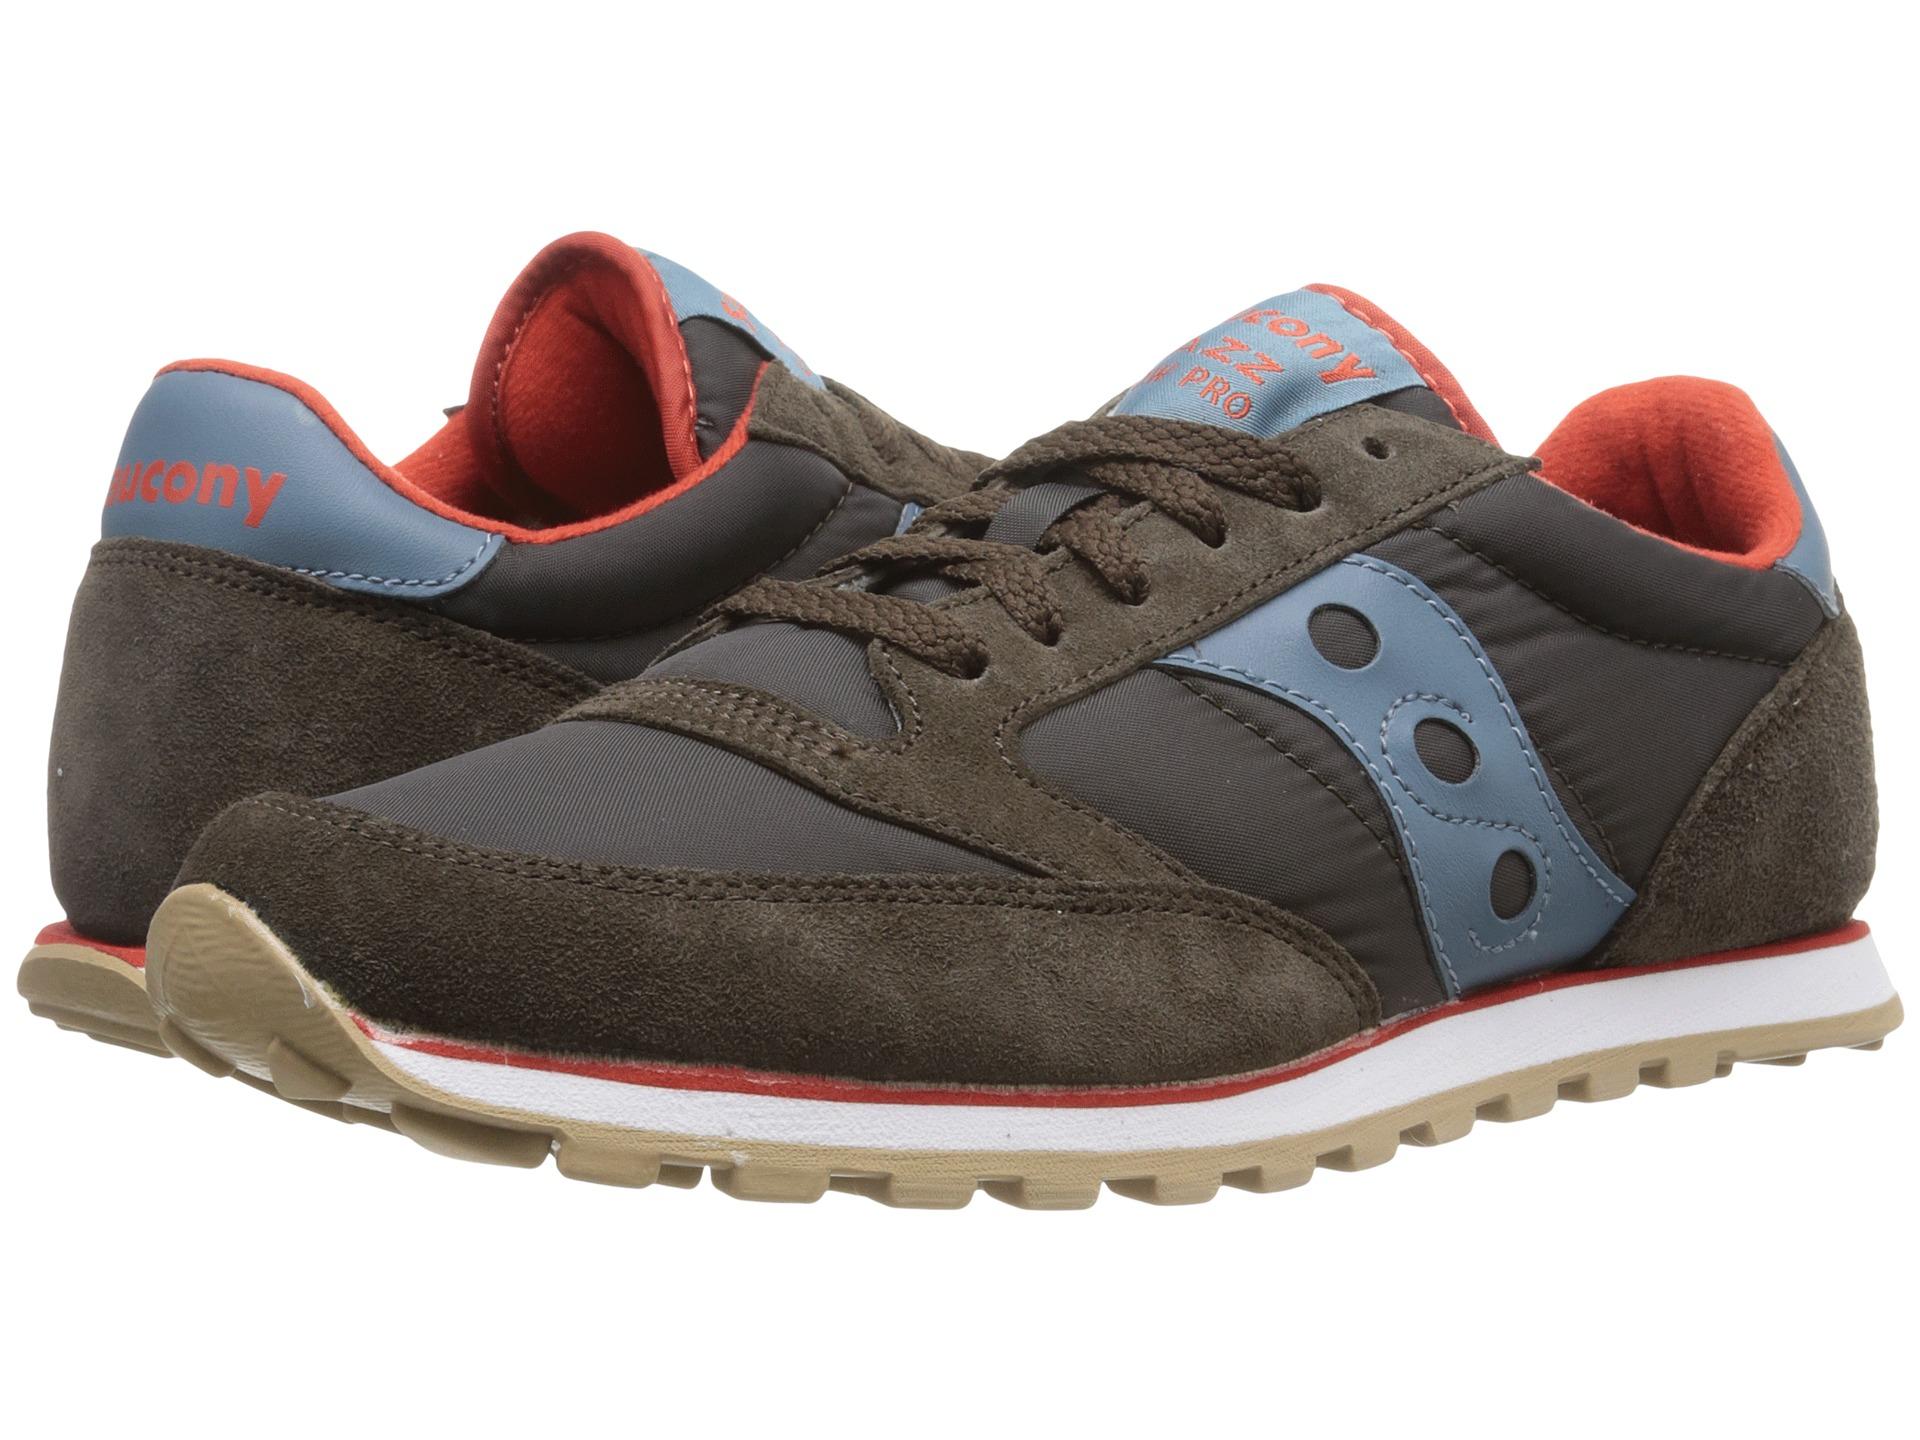 JAZZ LOW PRO W - FOOTWEAR - Low-tops & sneakers Saucony zmt4933Zw